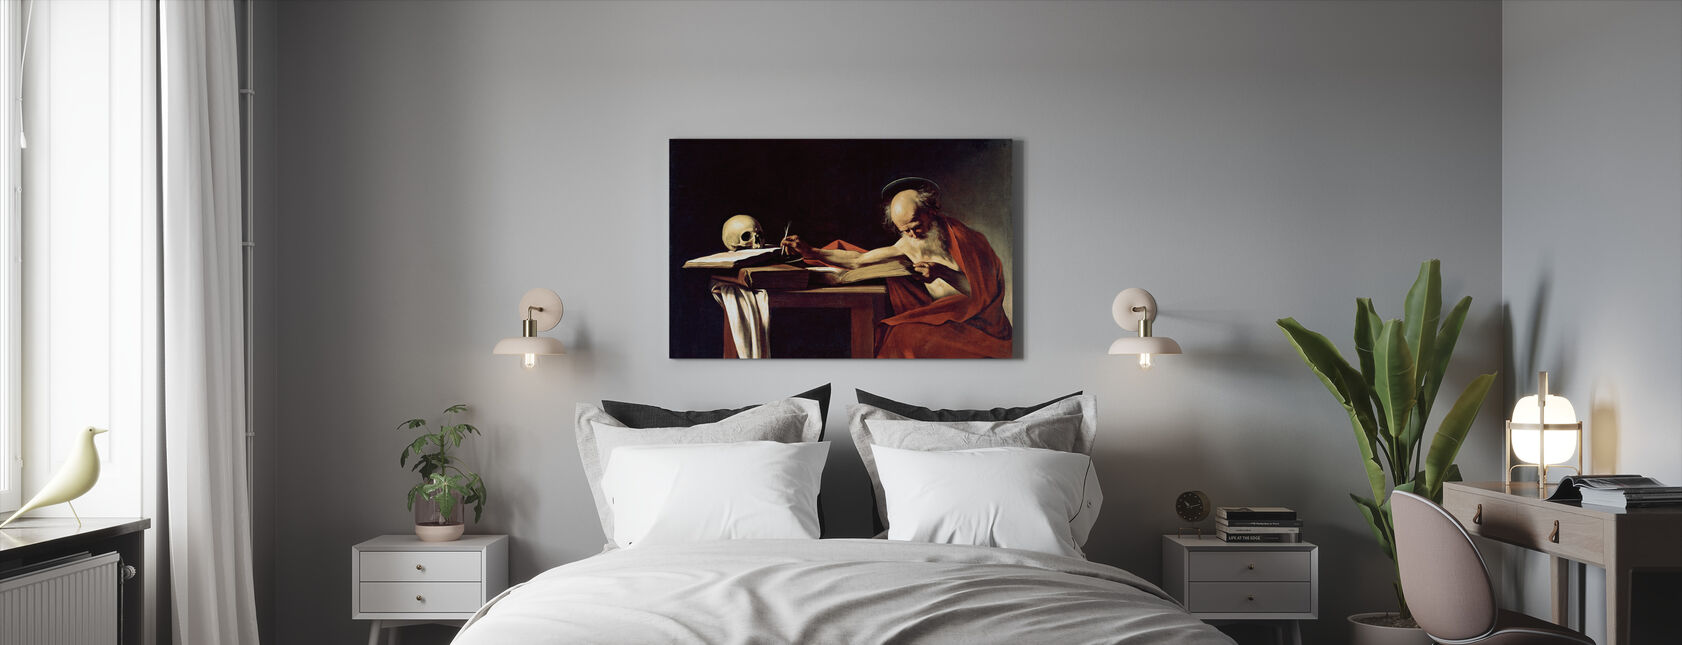 Saint Jerome - Michelangelo Merisi da Caravaggio - Canvas print - Bedroom